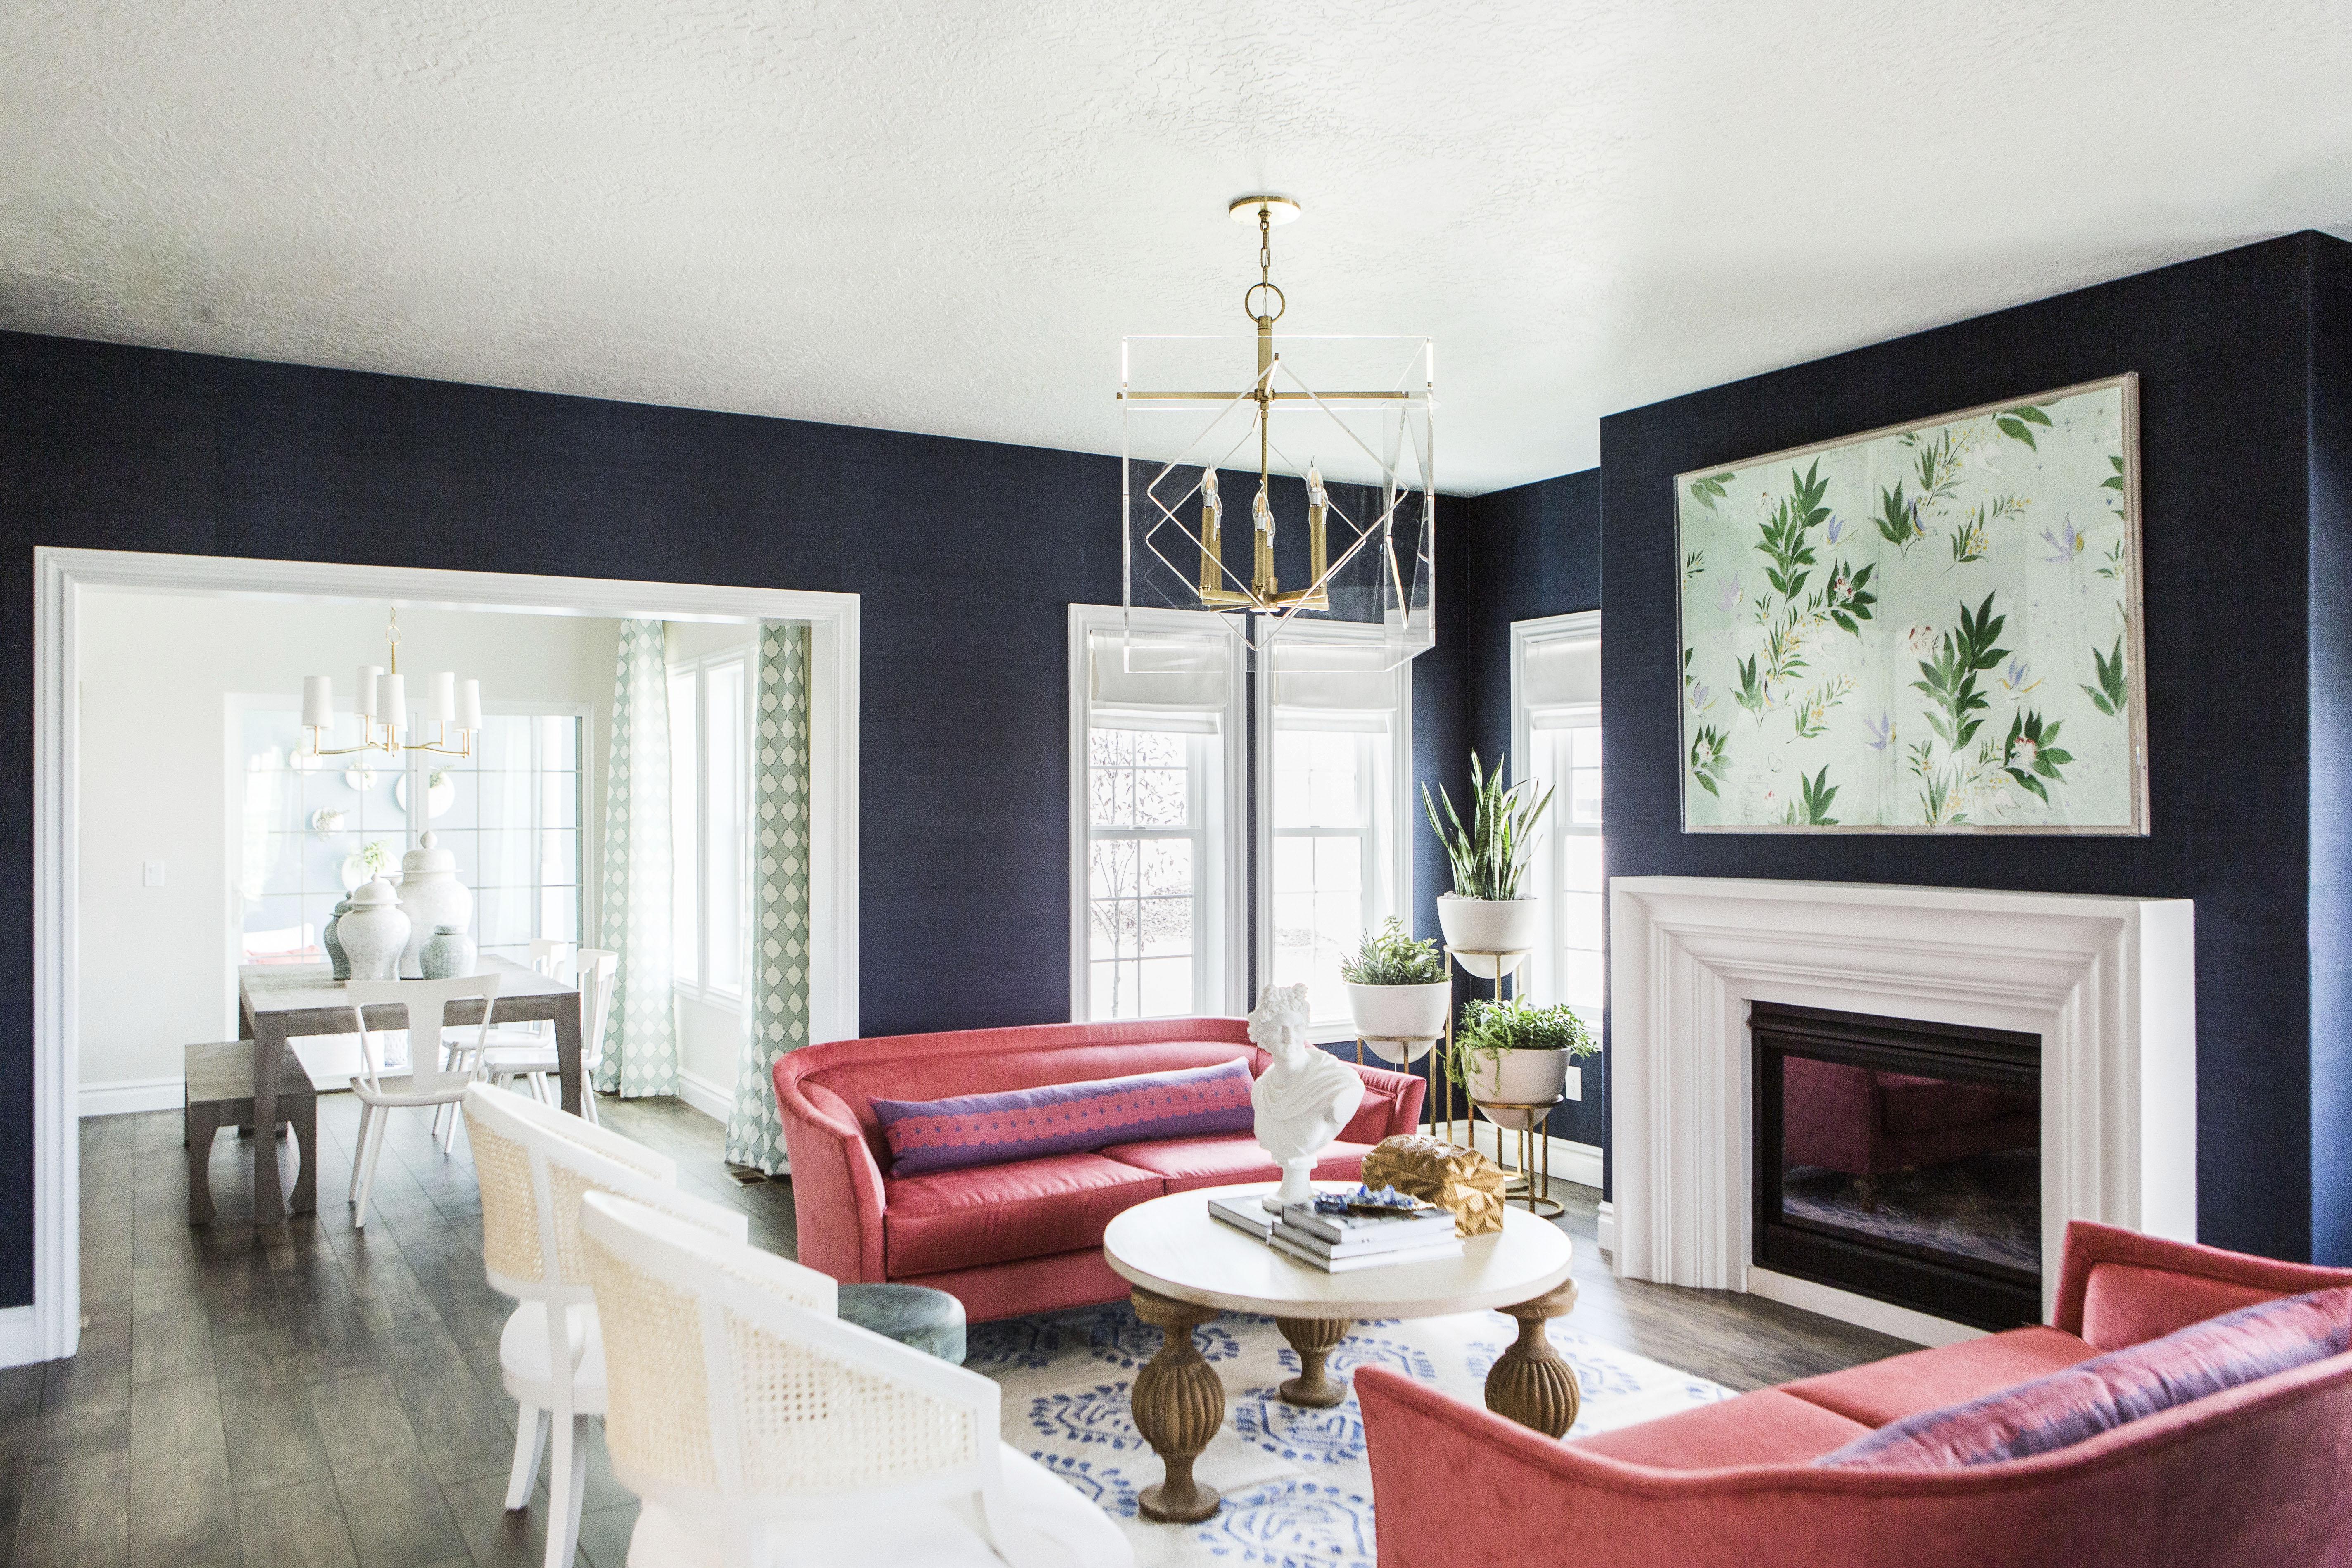 50 Best Living Room Ideas - Stylish Living Room Decorating ... on Small:szwbf50Ltbw= Living Room Decor Ideas  id=99767